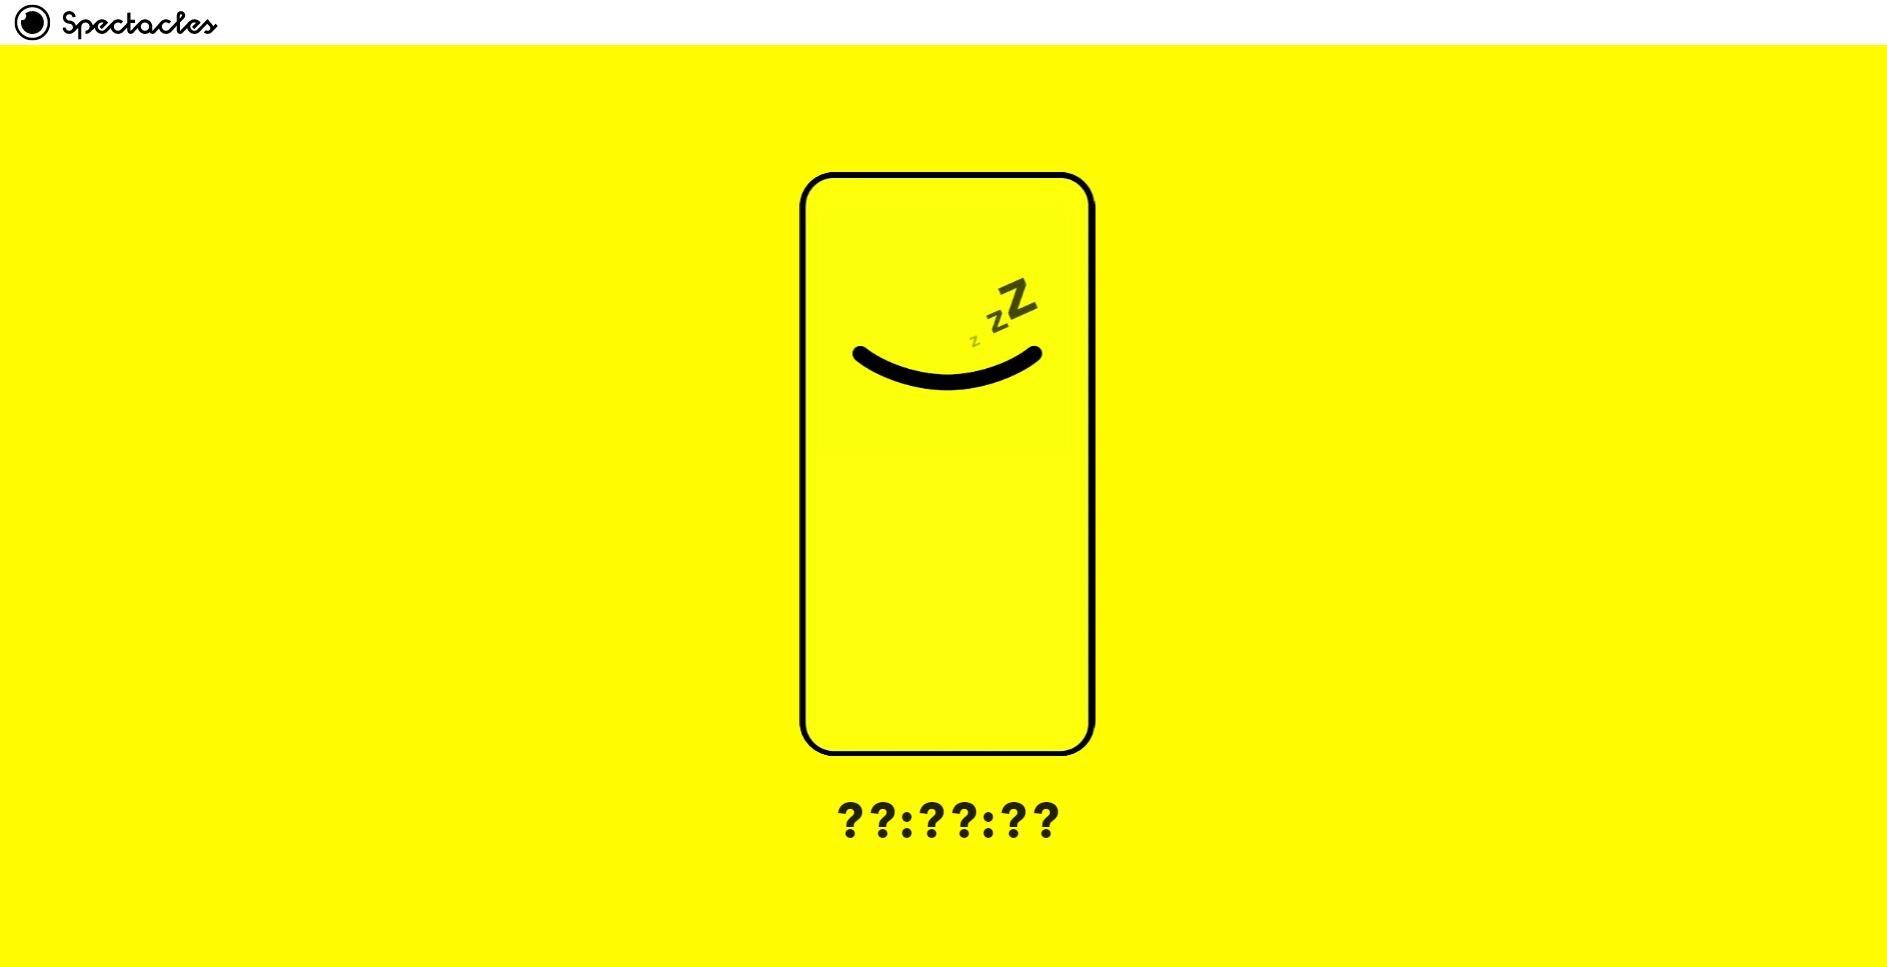 Imagen 5 de la campaña de marketing de la marca Spectacles by Sanp Inc